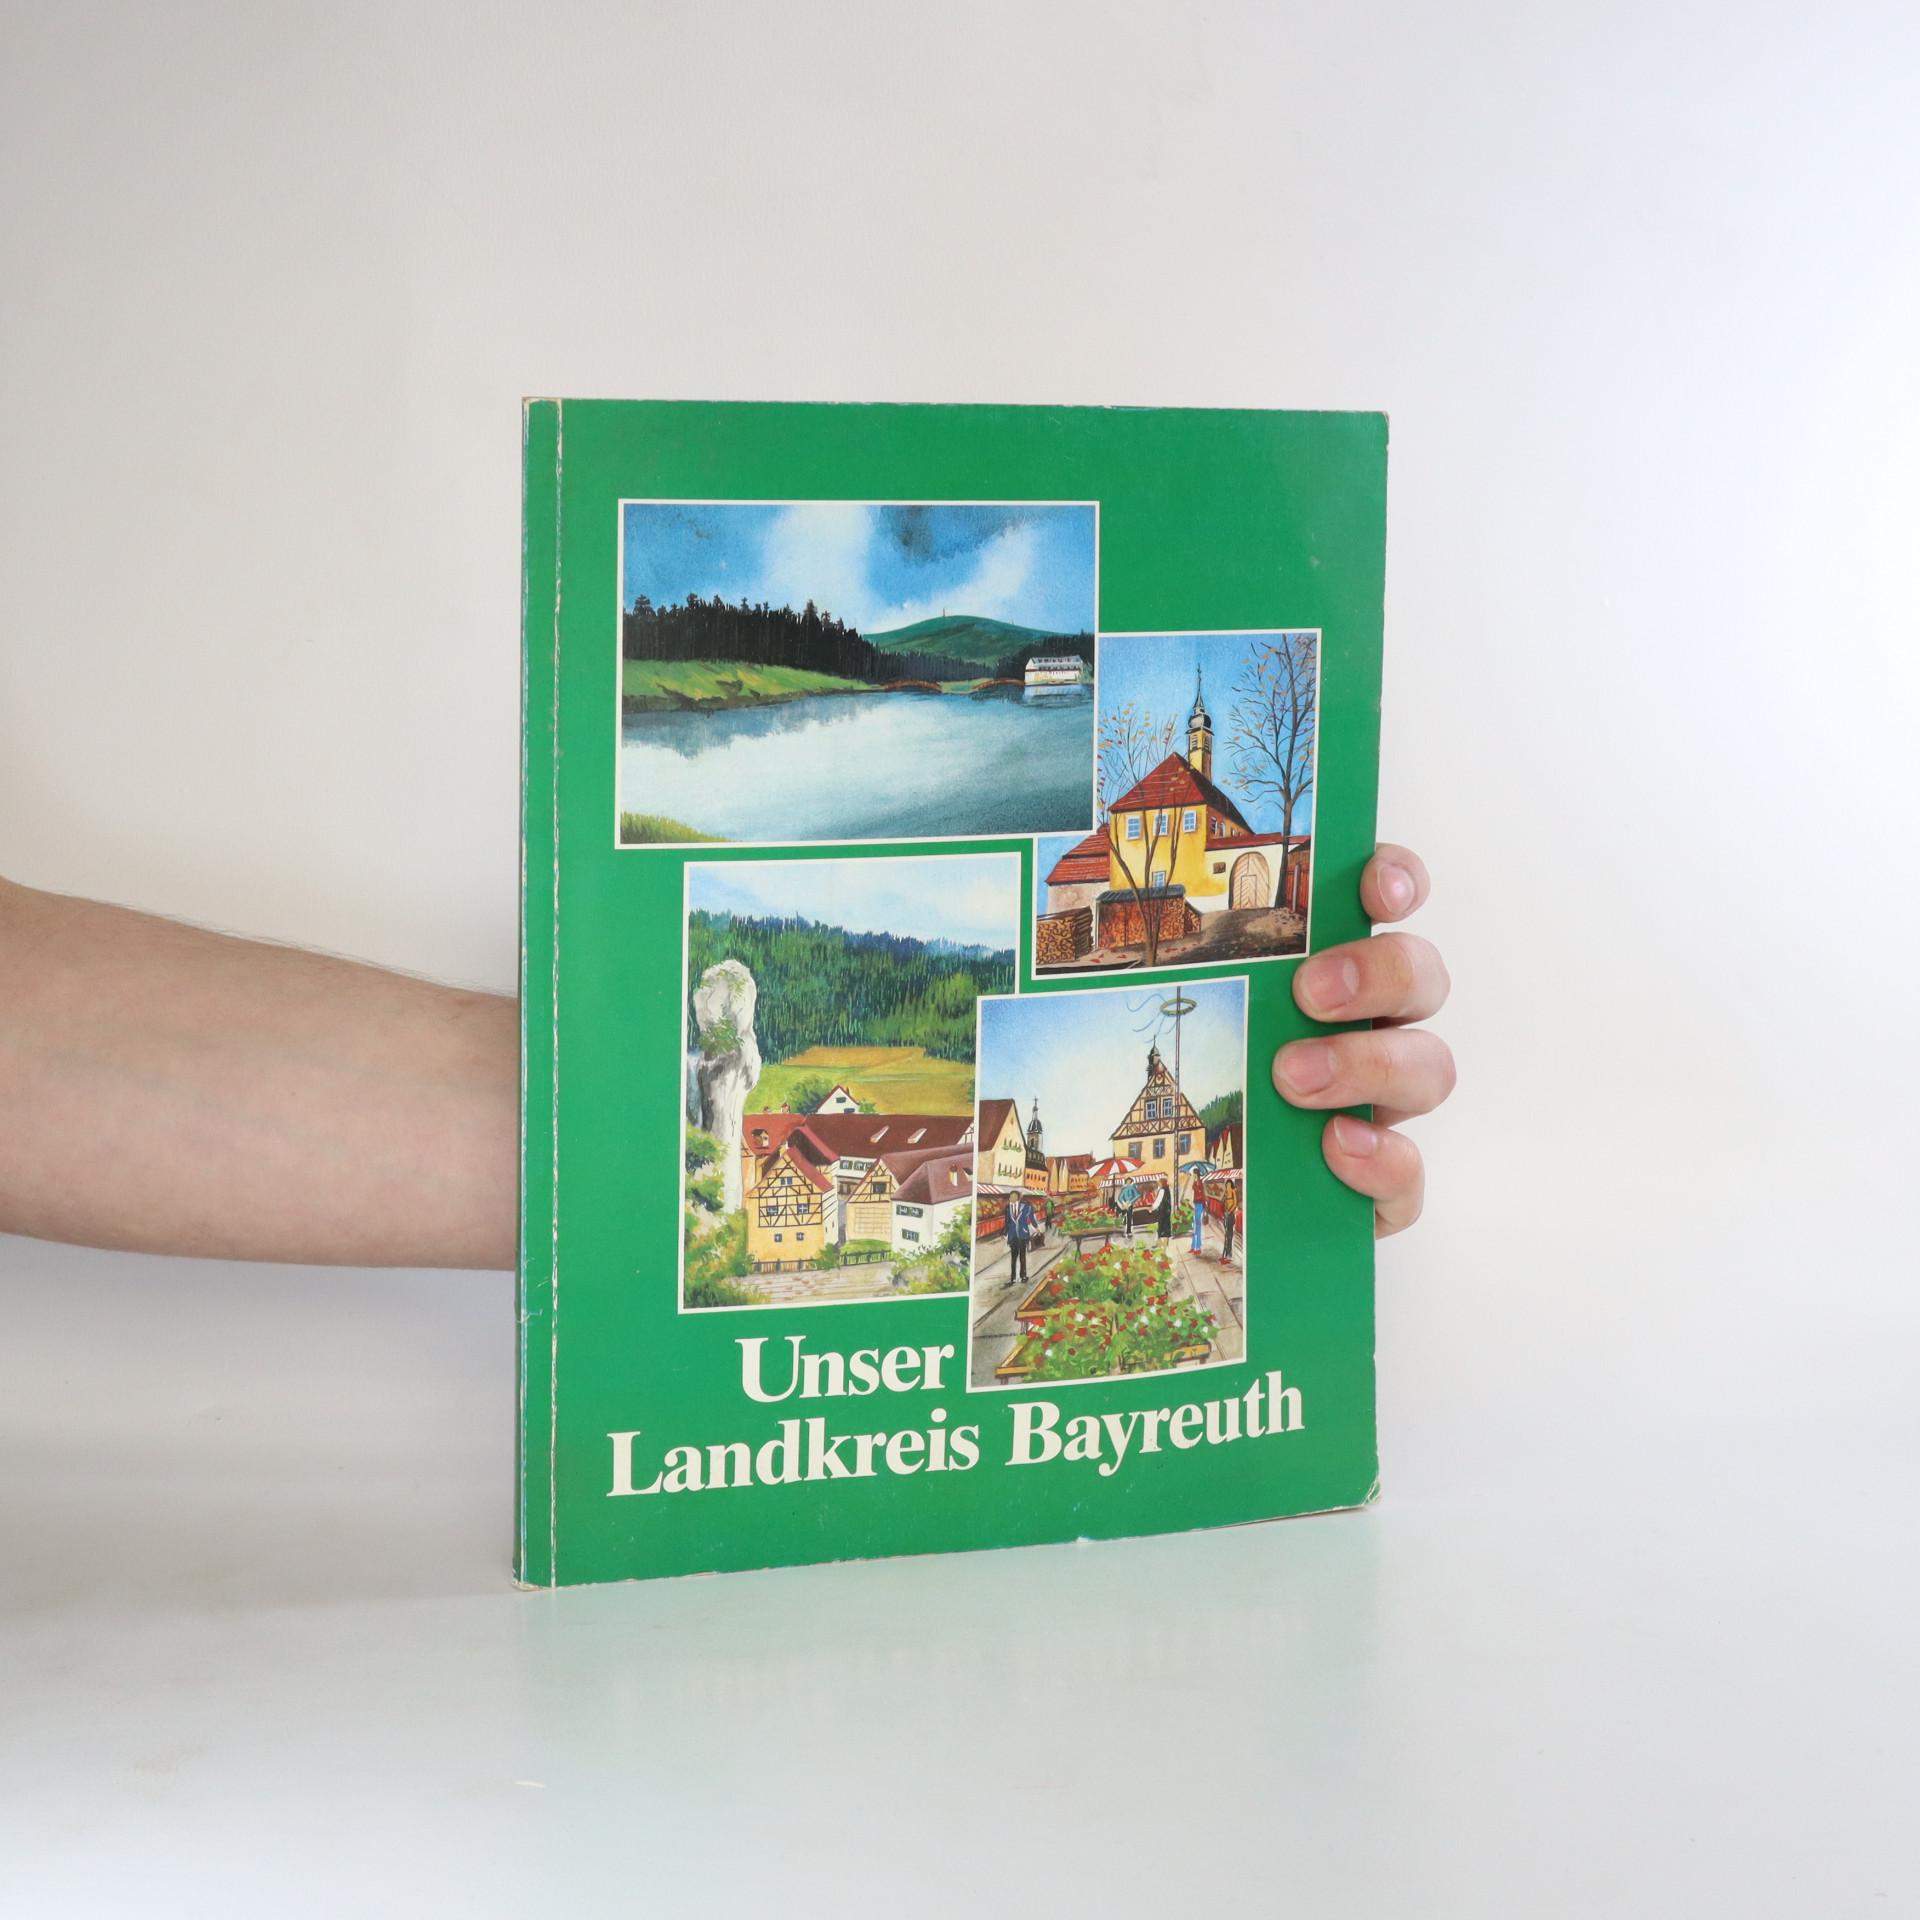 antikvární kniha Unser Landkreis Beyreuth, 1988